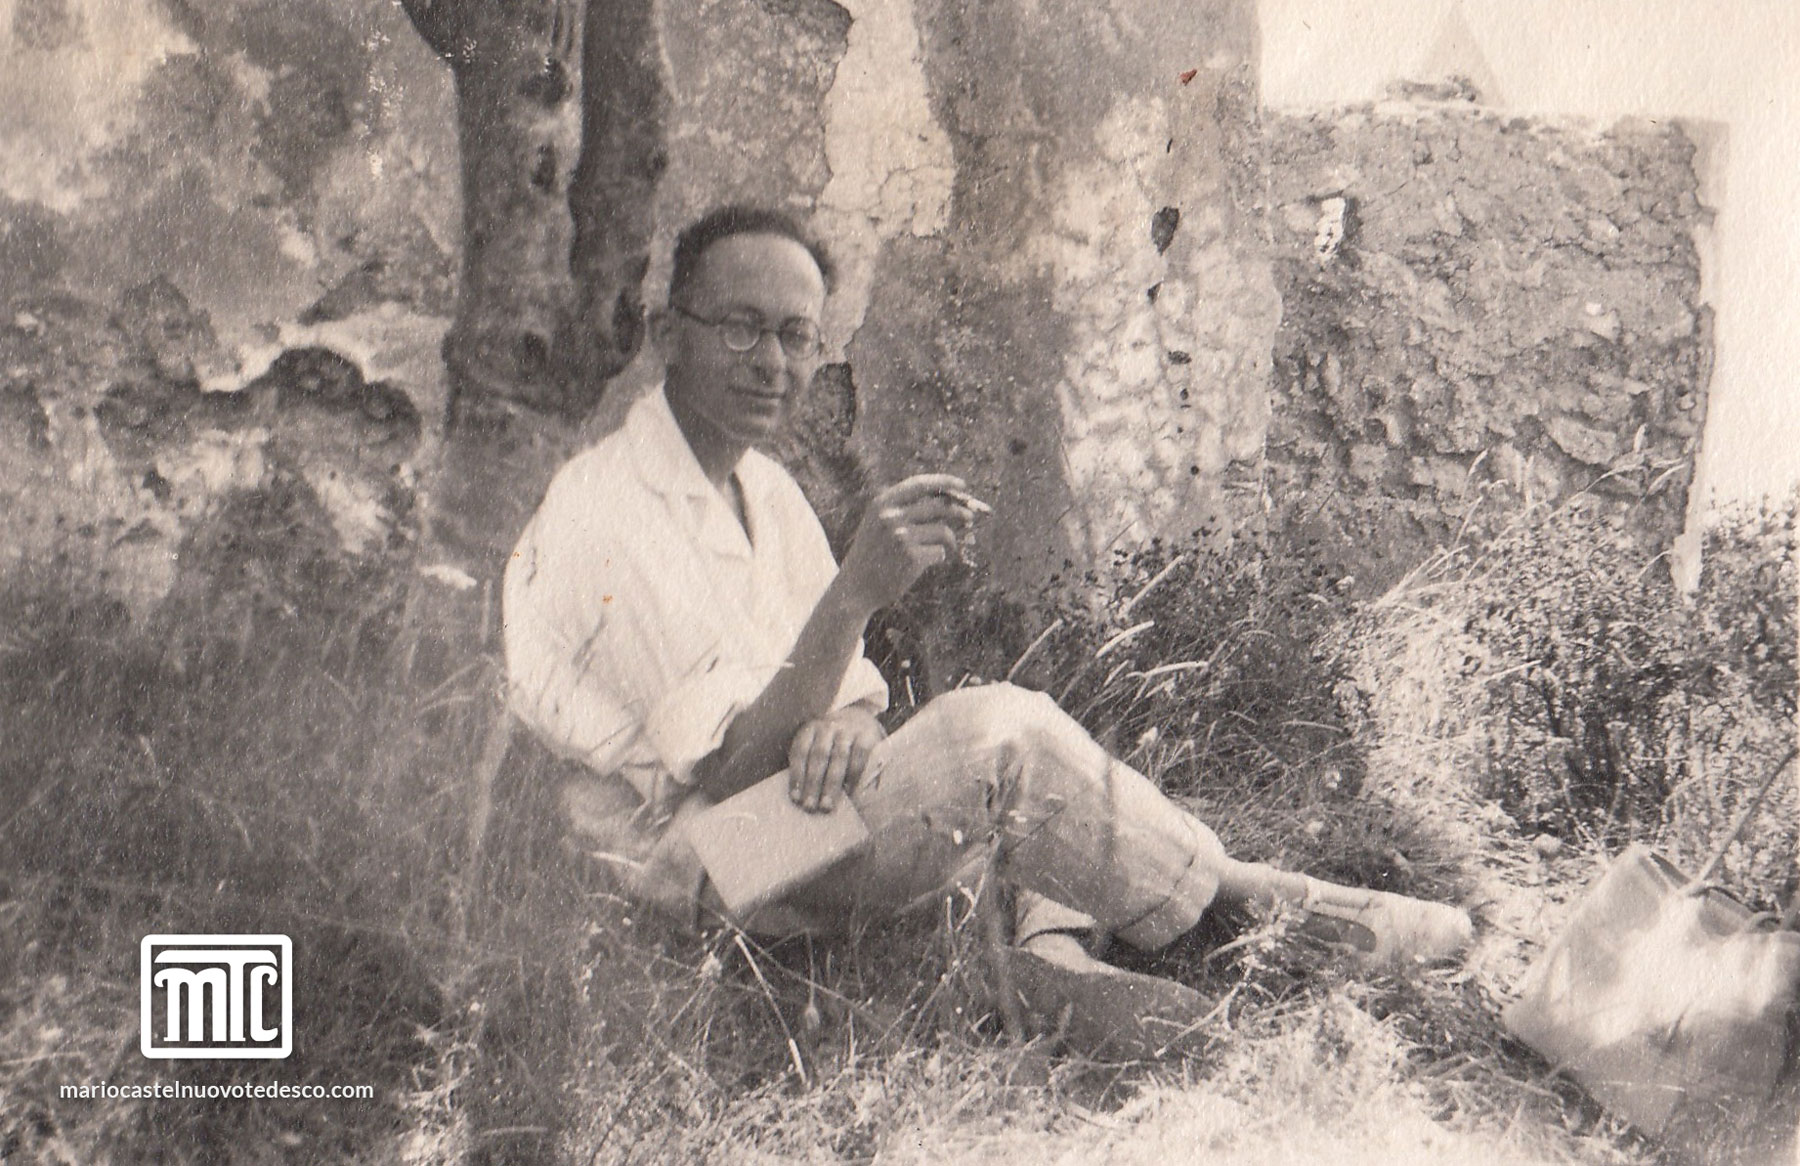 MCT, Anacapri,1929